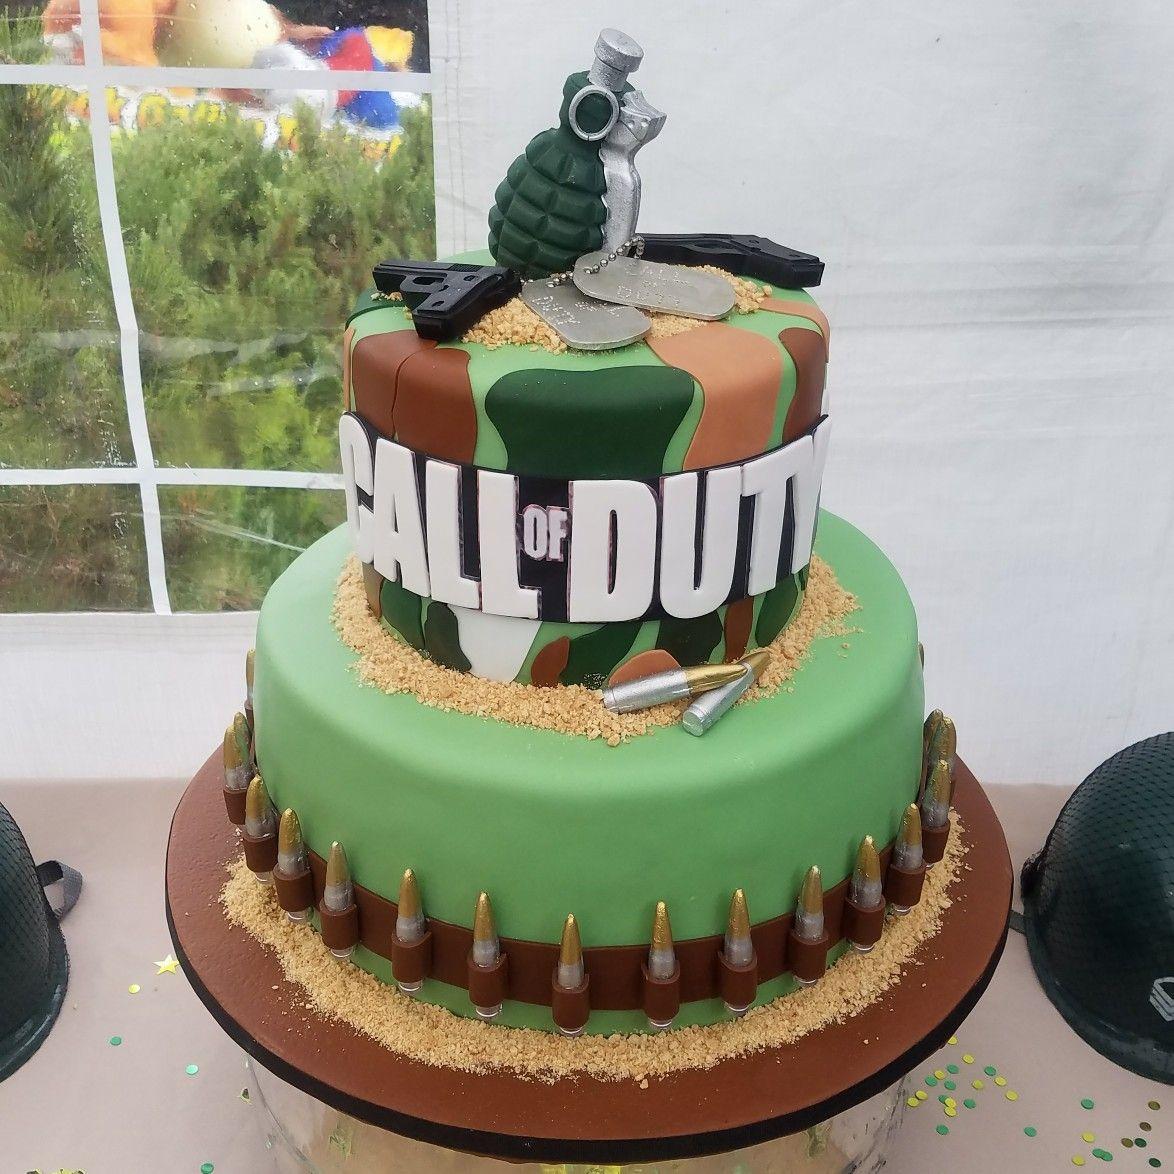 Call of duty wwii theme birthday cake birthday cake for